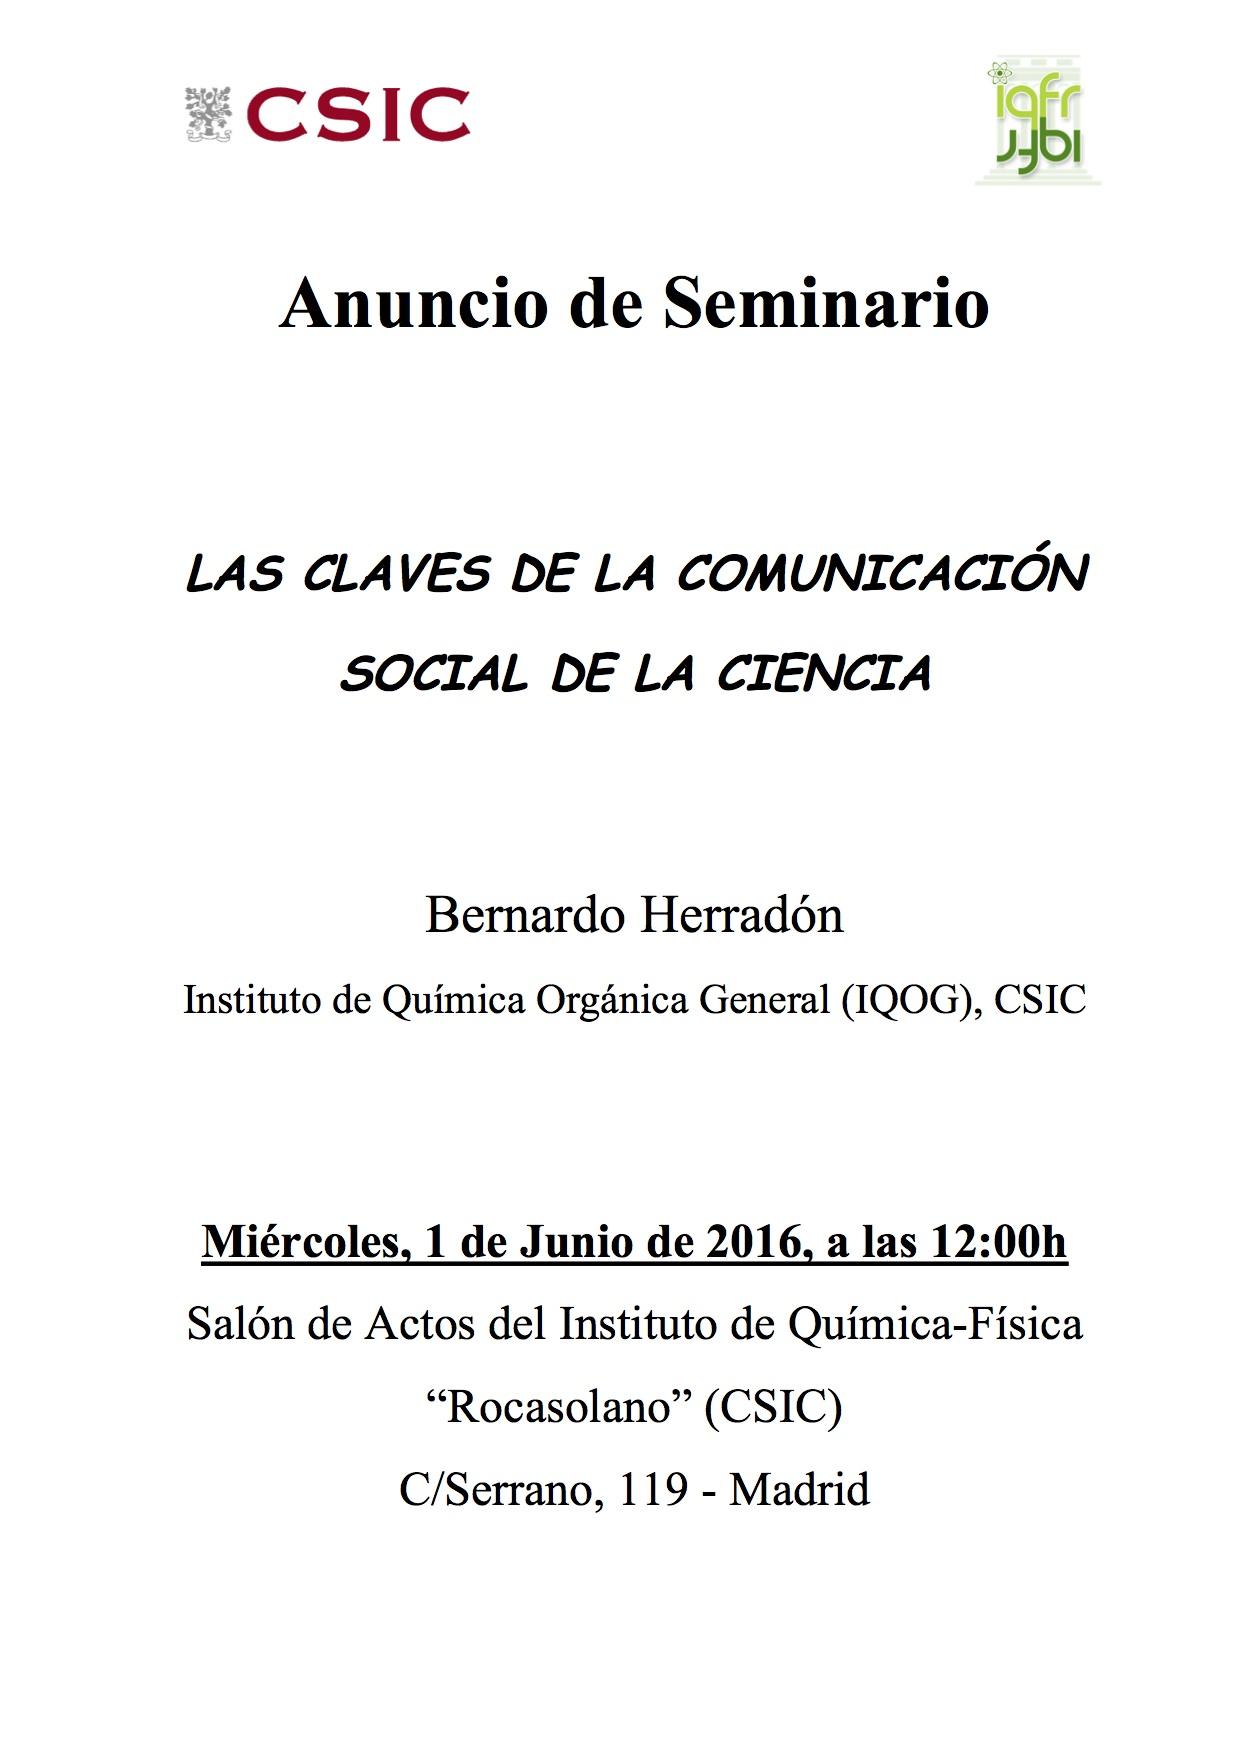 Anuncio_Seminario_Bernardo_Herradon_1Junio2016